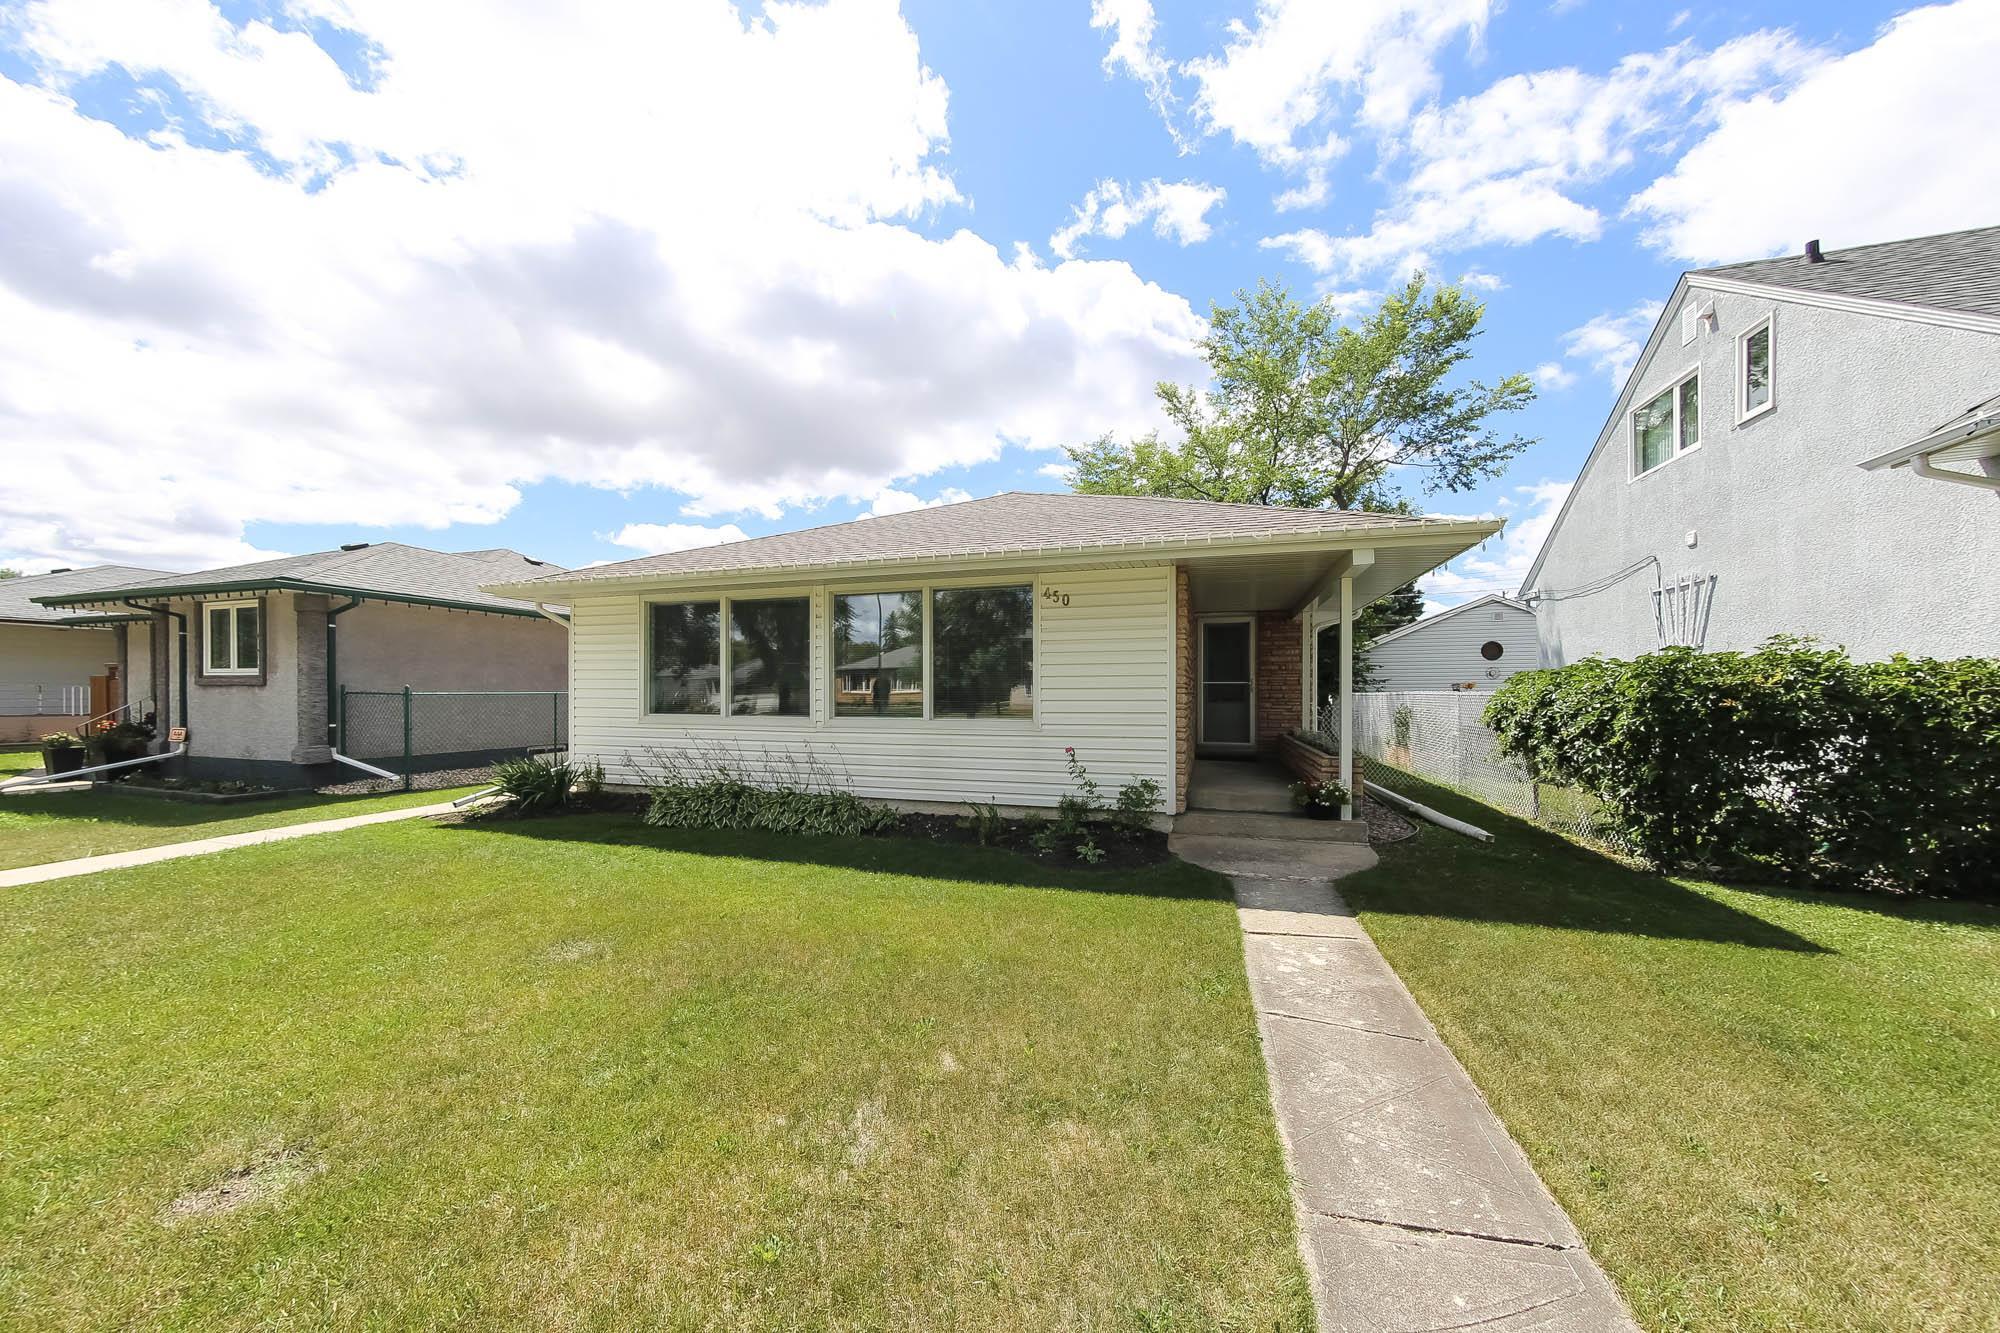 450 Burrin Ave, Winnipeg, Manitoba  R2V 1G2 - Photo 32 - 202018089